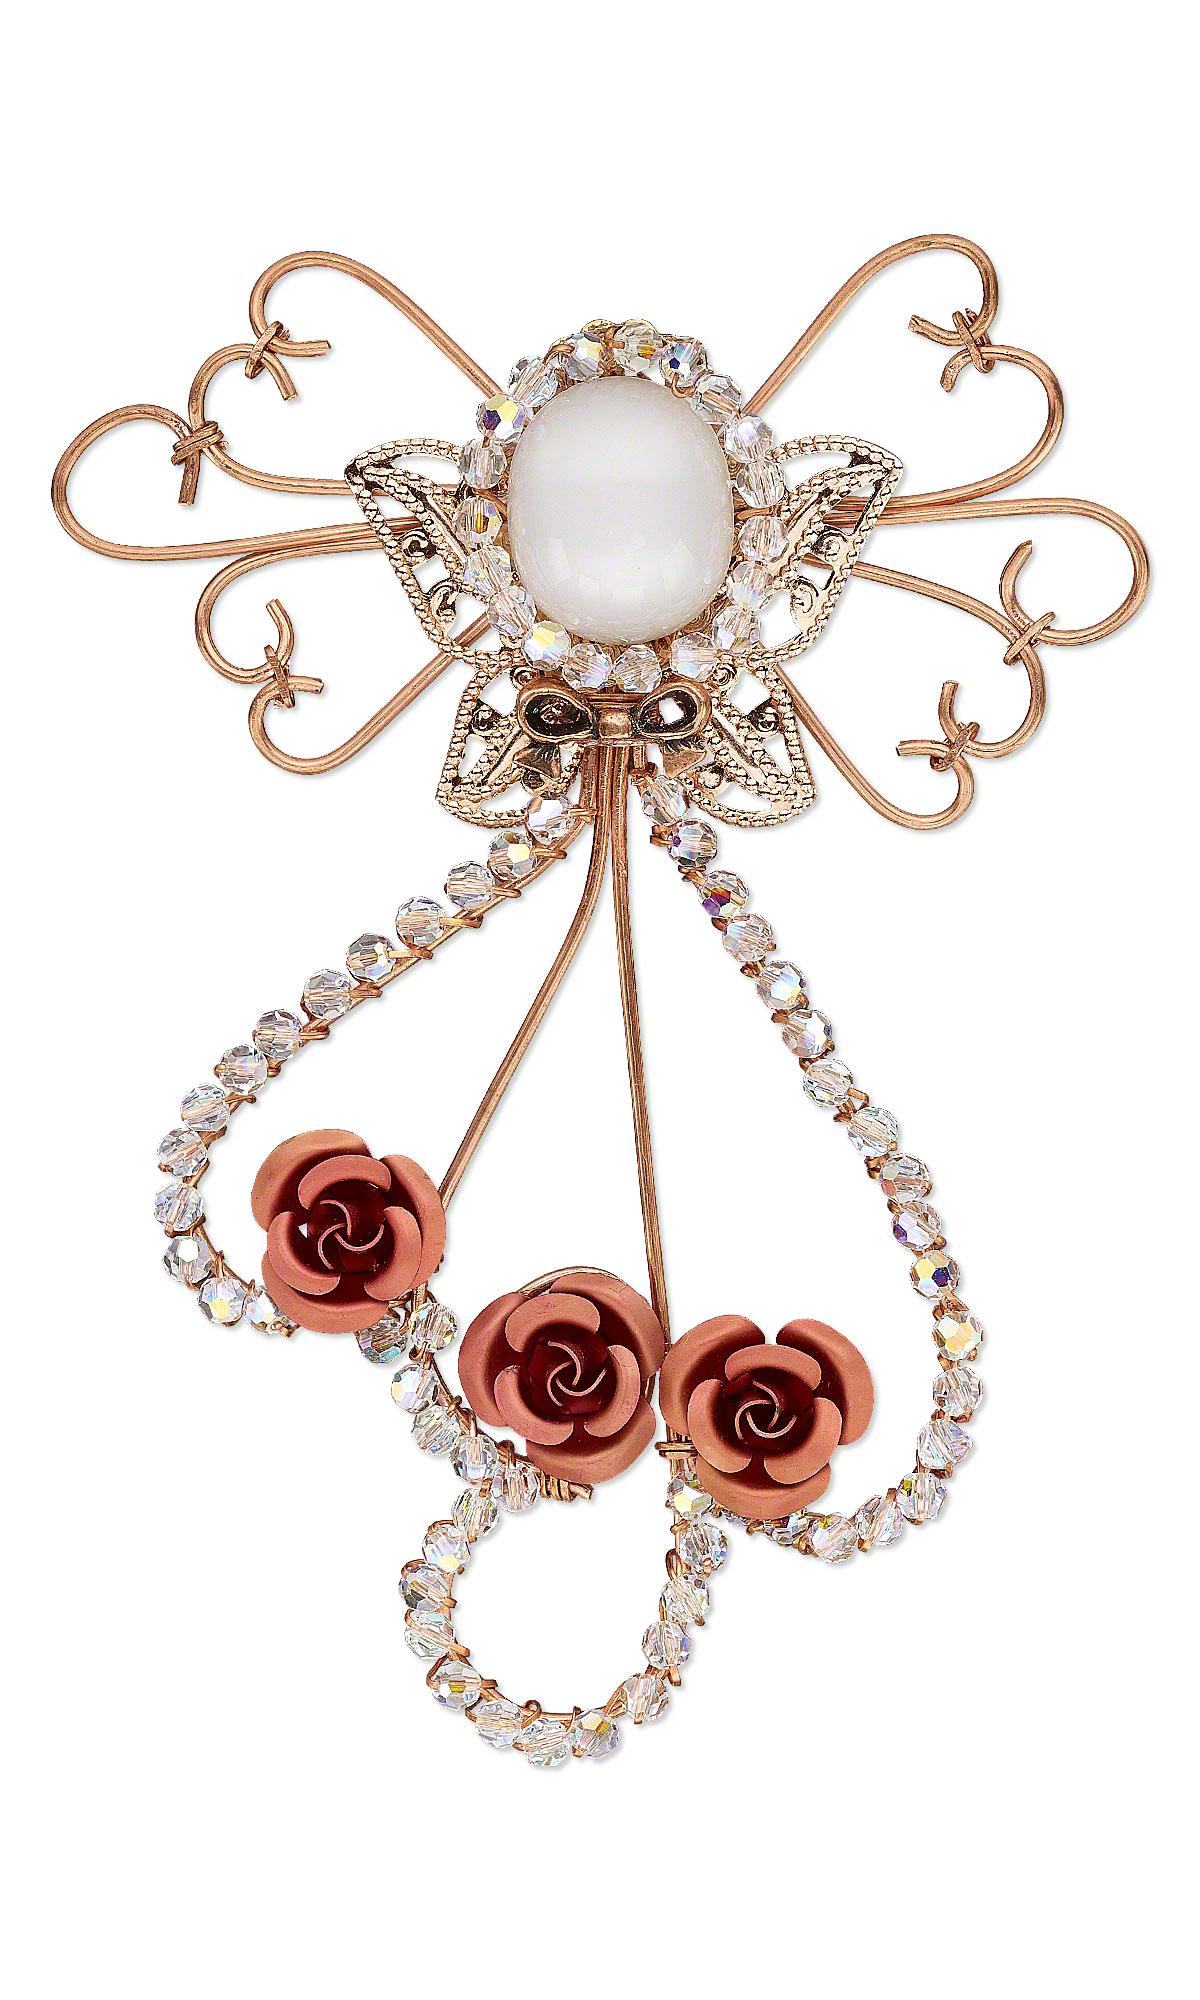 Jewelry Design - Angel Pin with Swarovski Crystal Beads, Aluminum ...